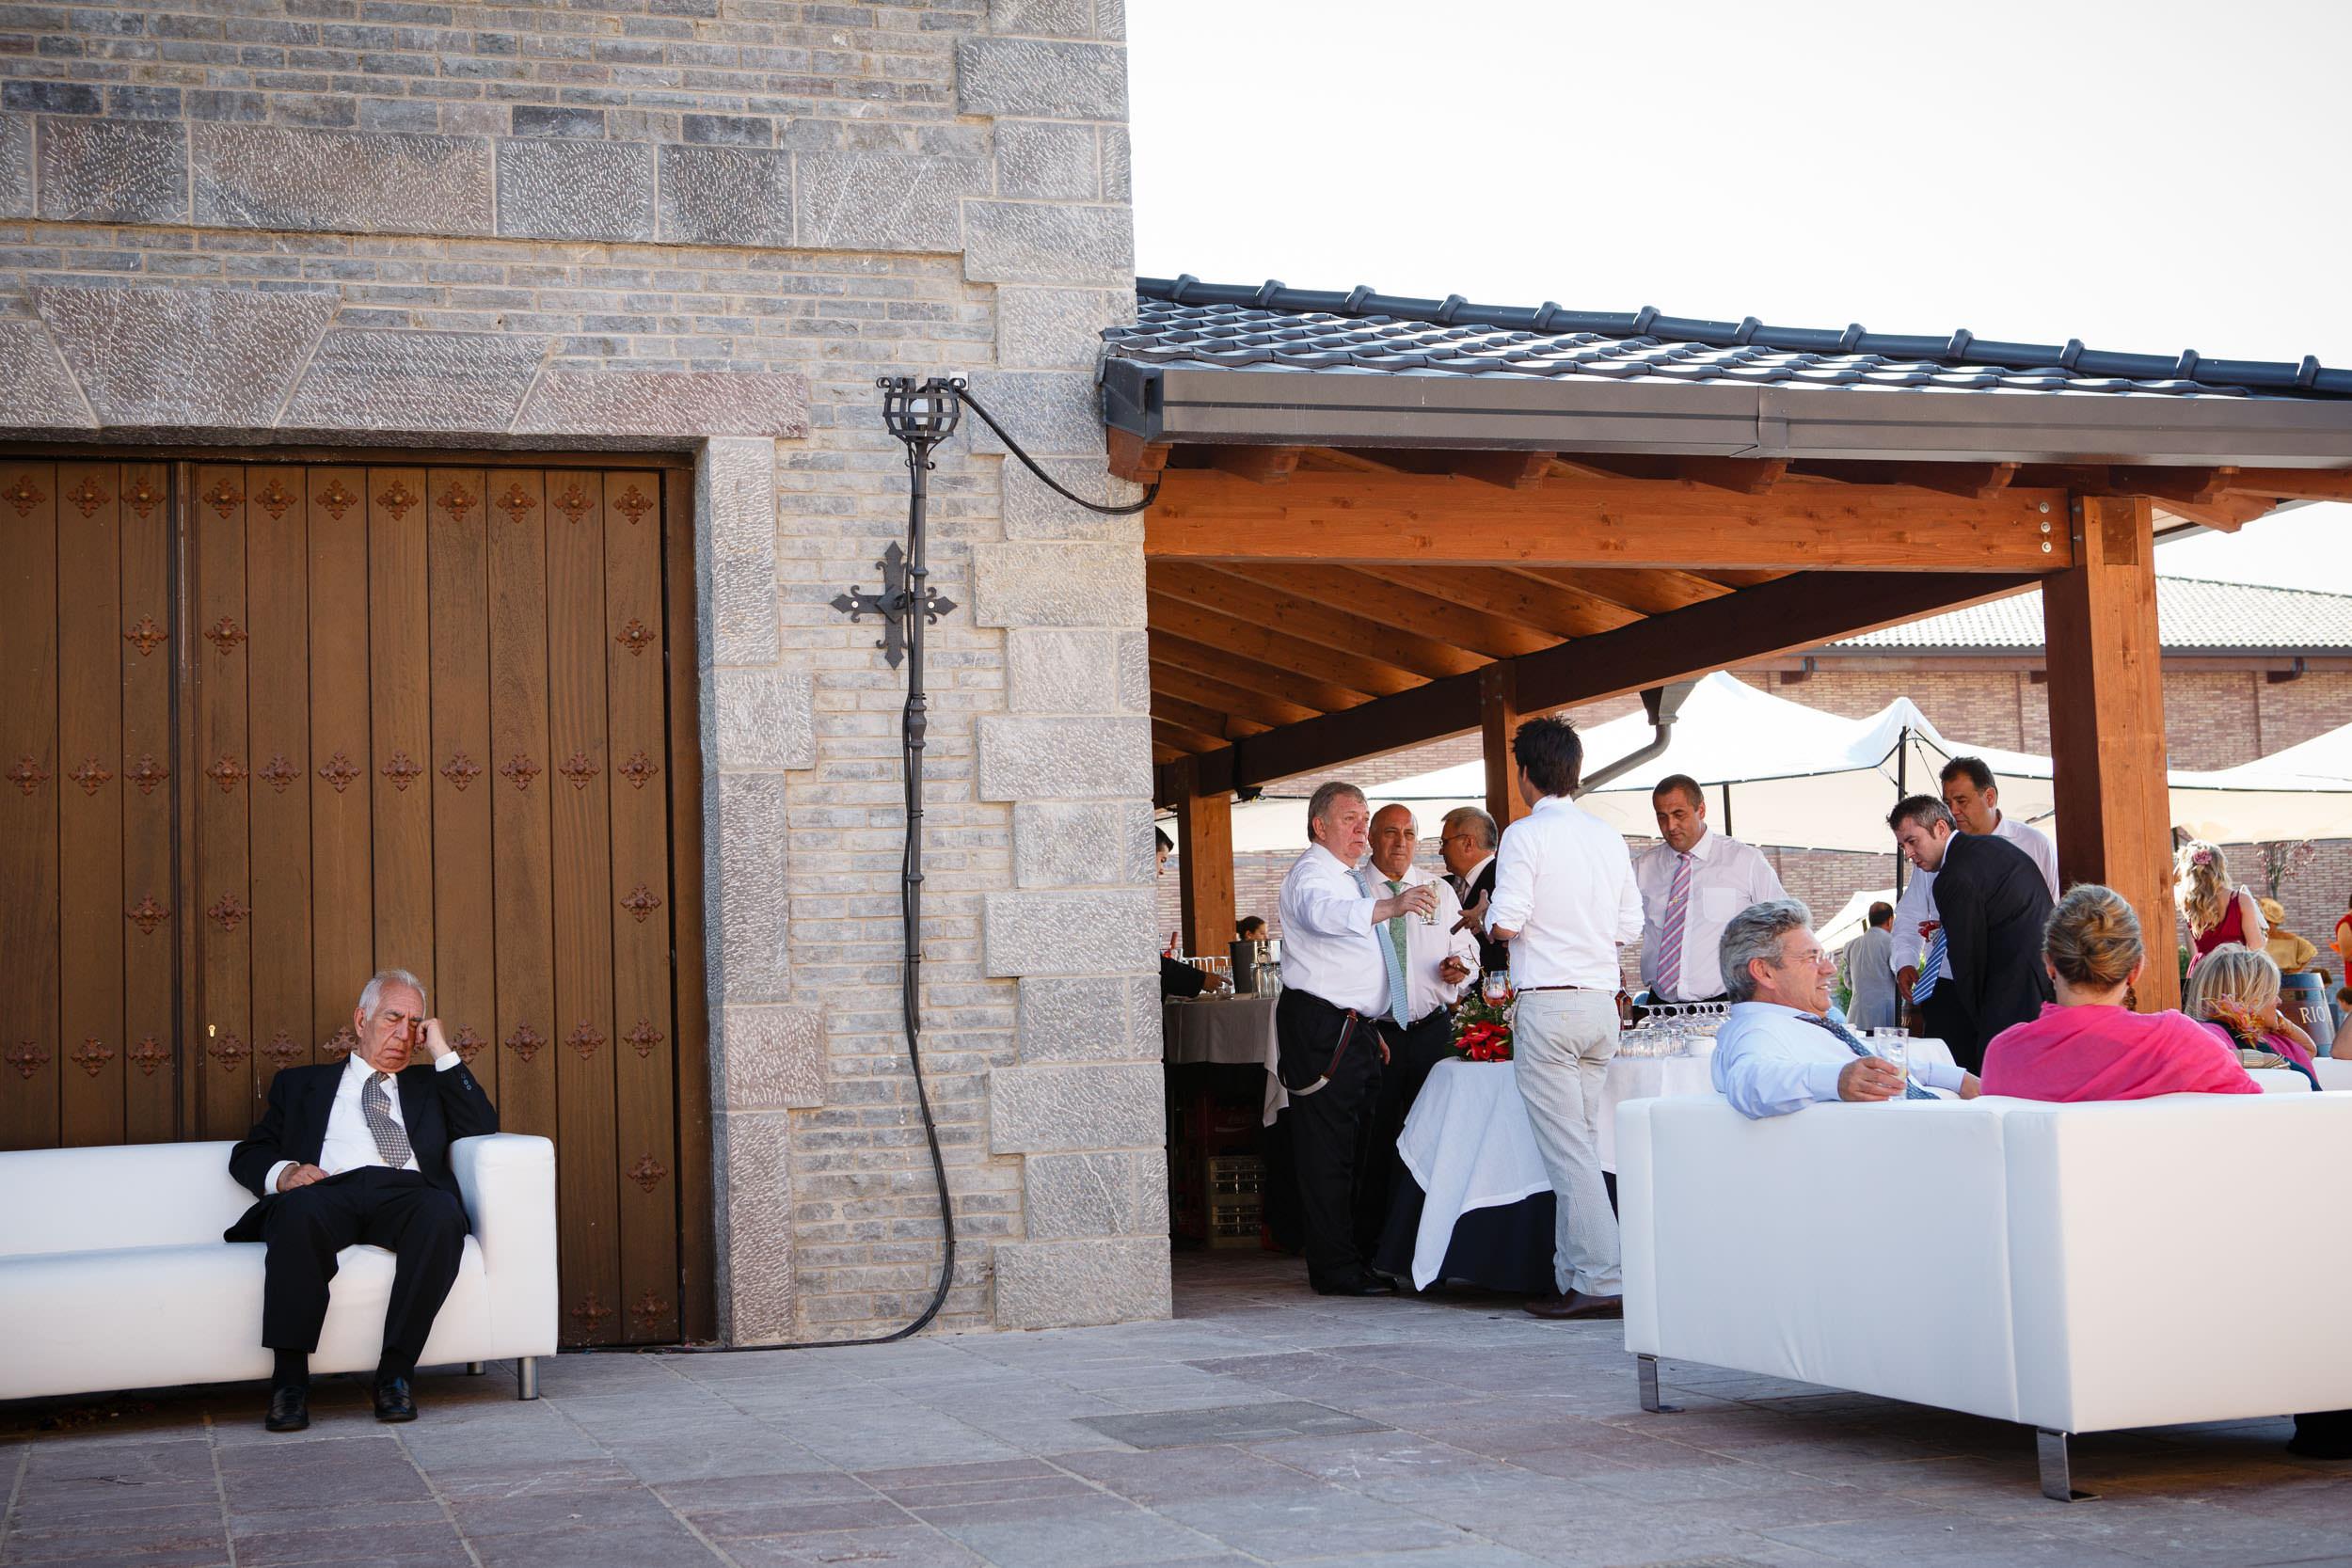 6/7/13 Boda de  Laura e Ismael, Castillo de Davalillo y Bodegas Señorio de Villarrica, Hervias, La Rioja. Foto de James Sturcke Fotografía | www.sturcke.org